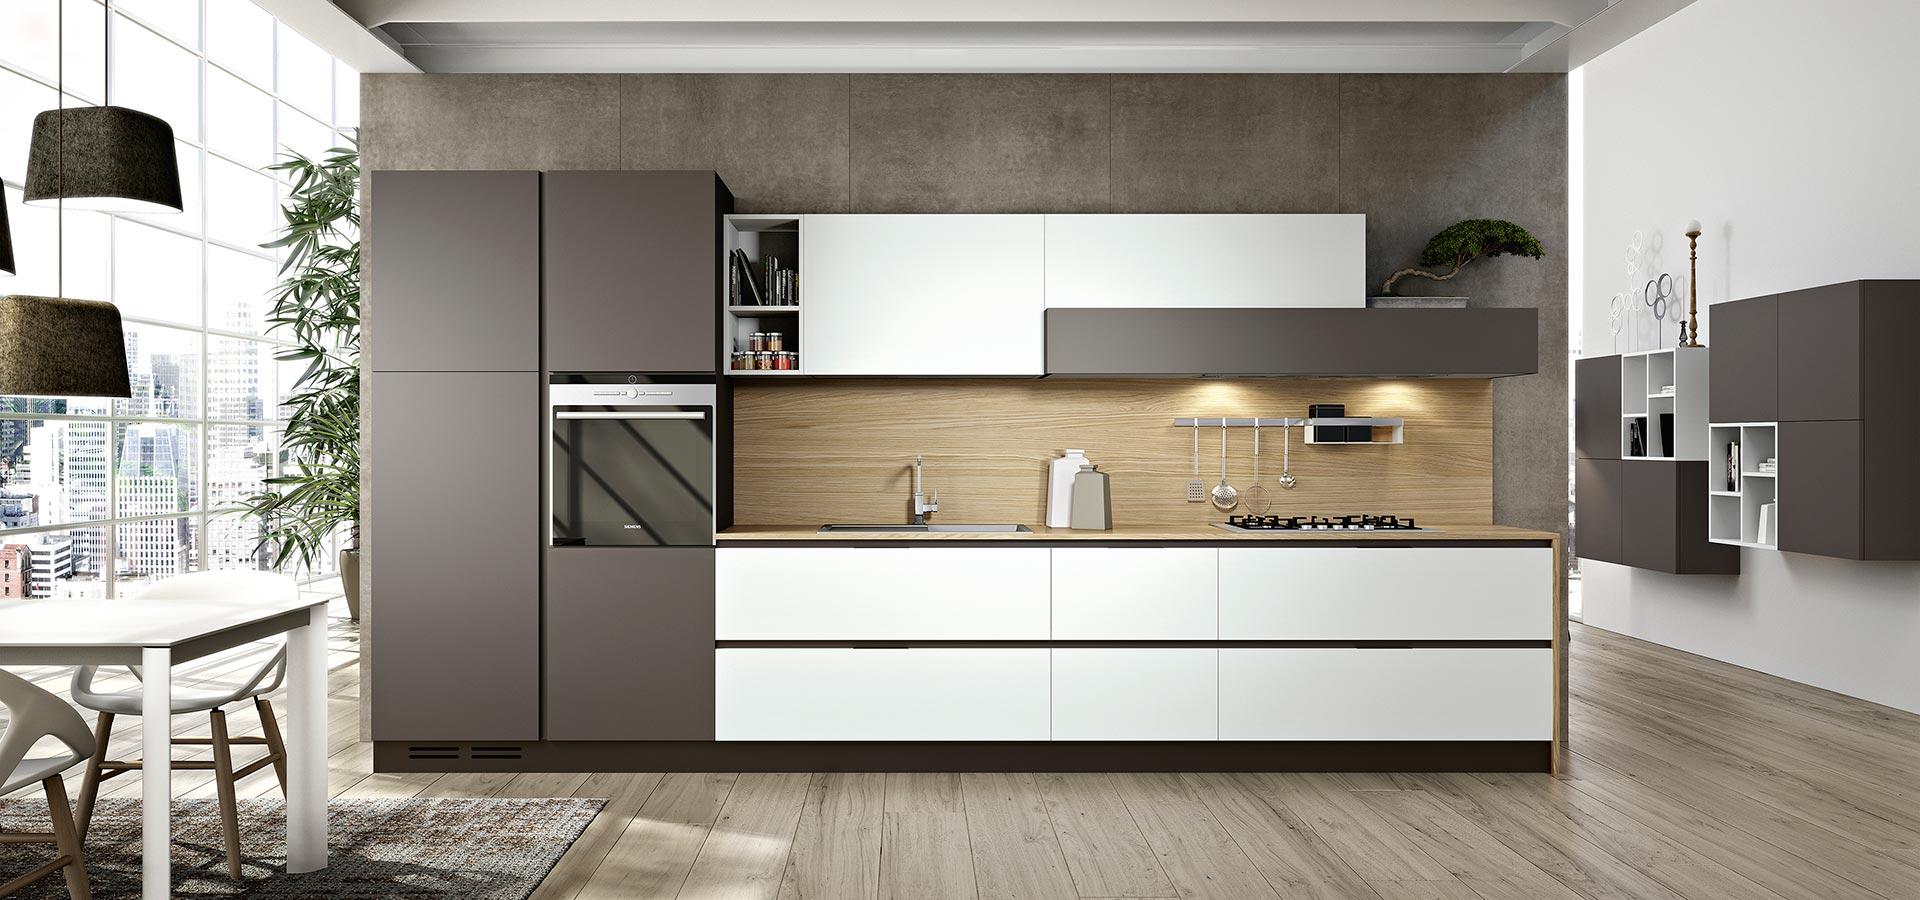 Stunning Rivestimenti Cucina Moderna Bianca Gallery - Ideas ...